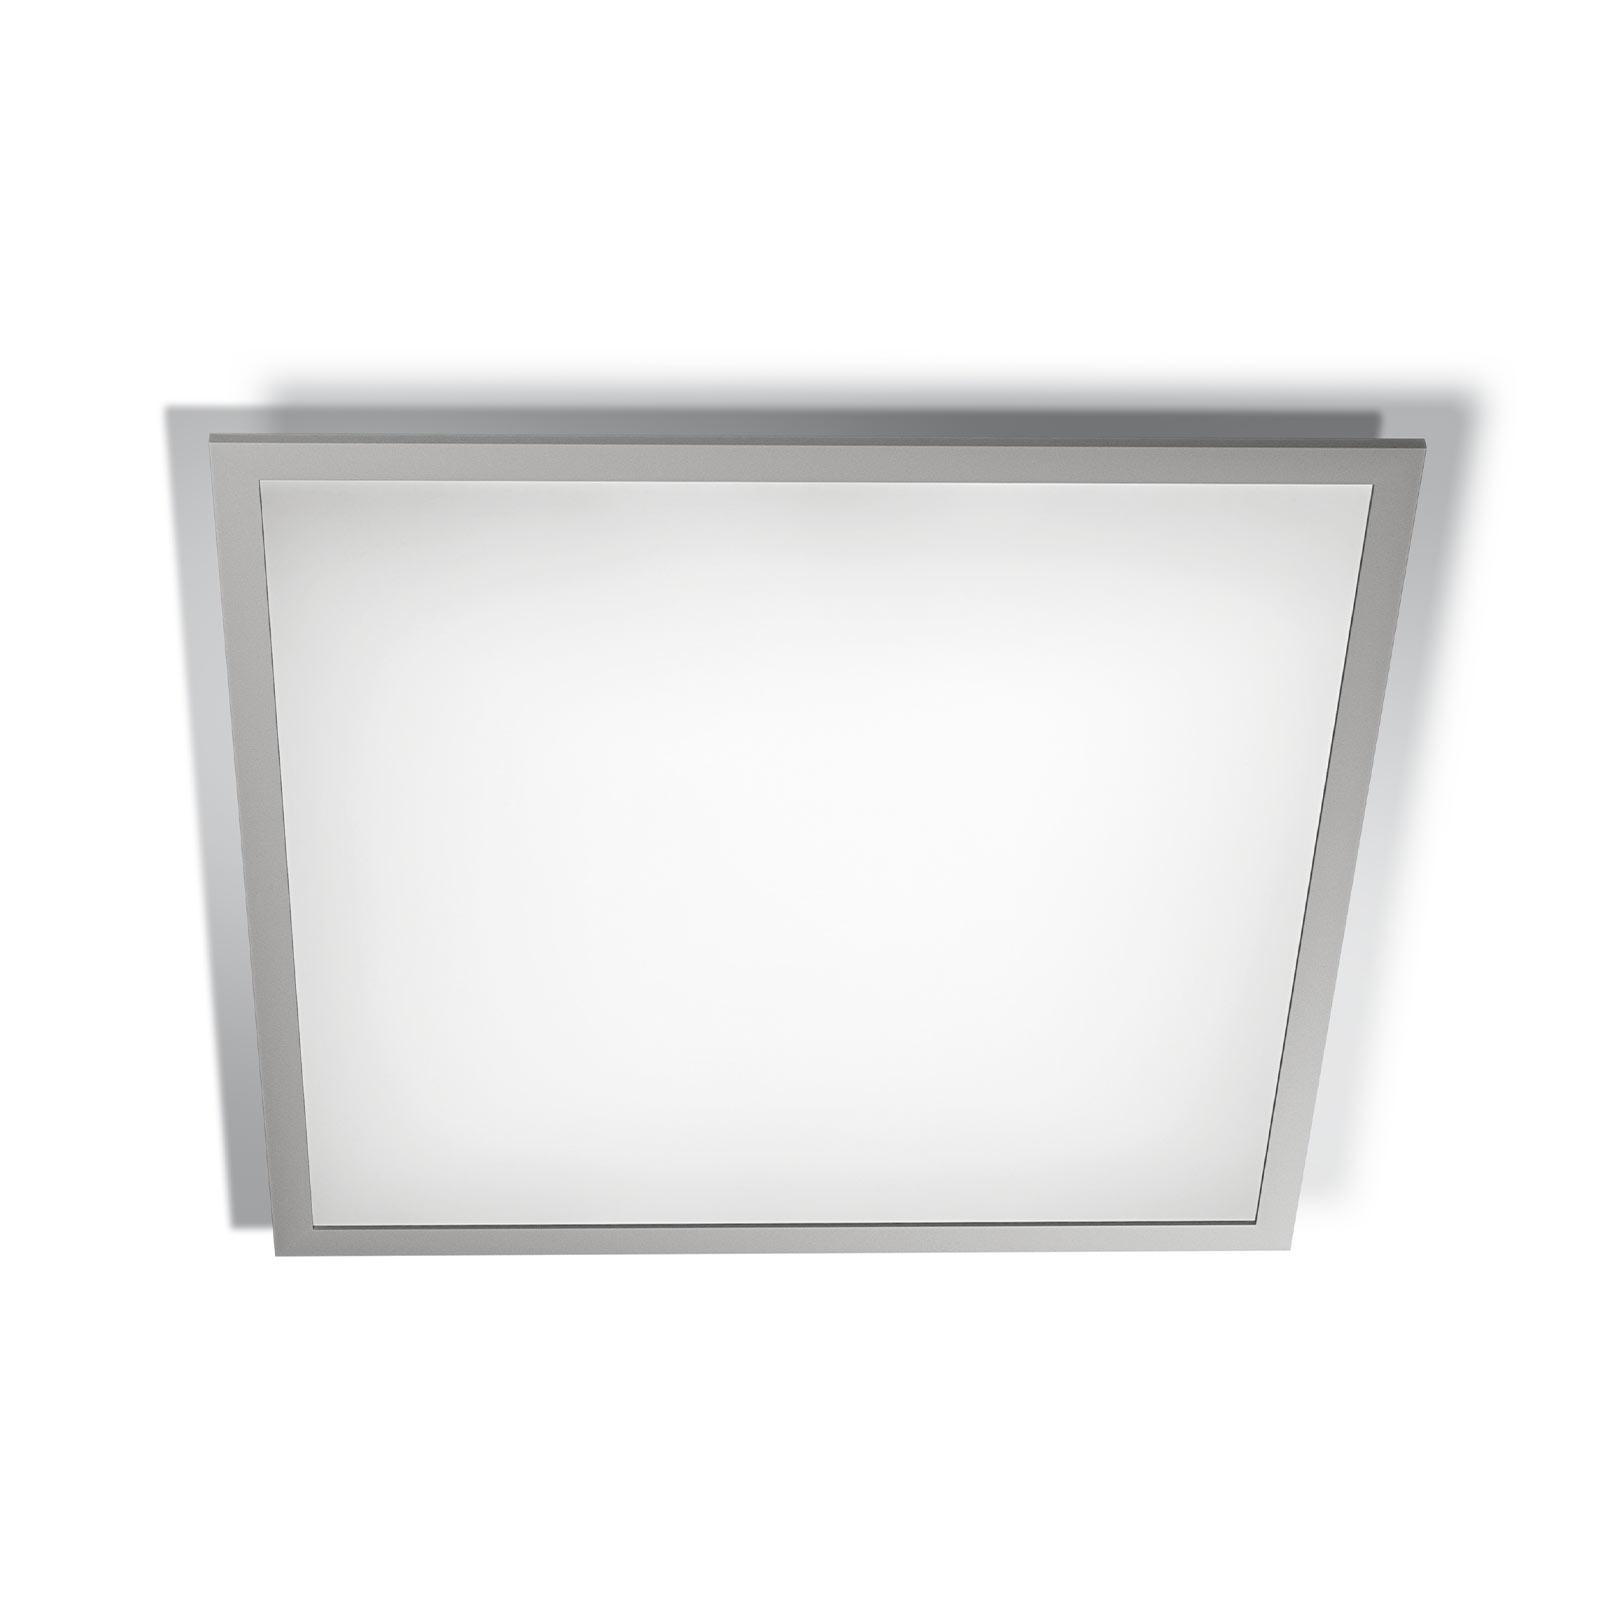 LEDVANCE Planon Plus LED-paneeli 60x60cm 830 36W